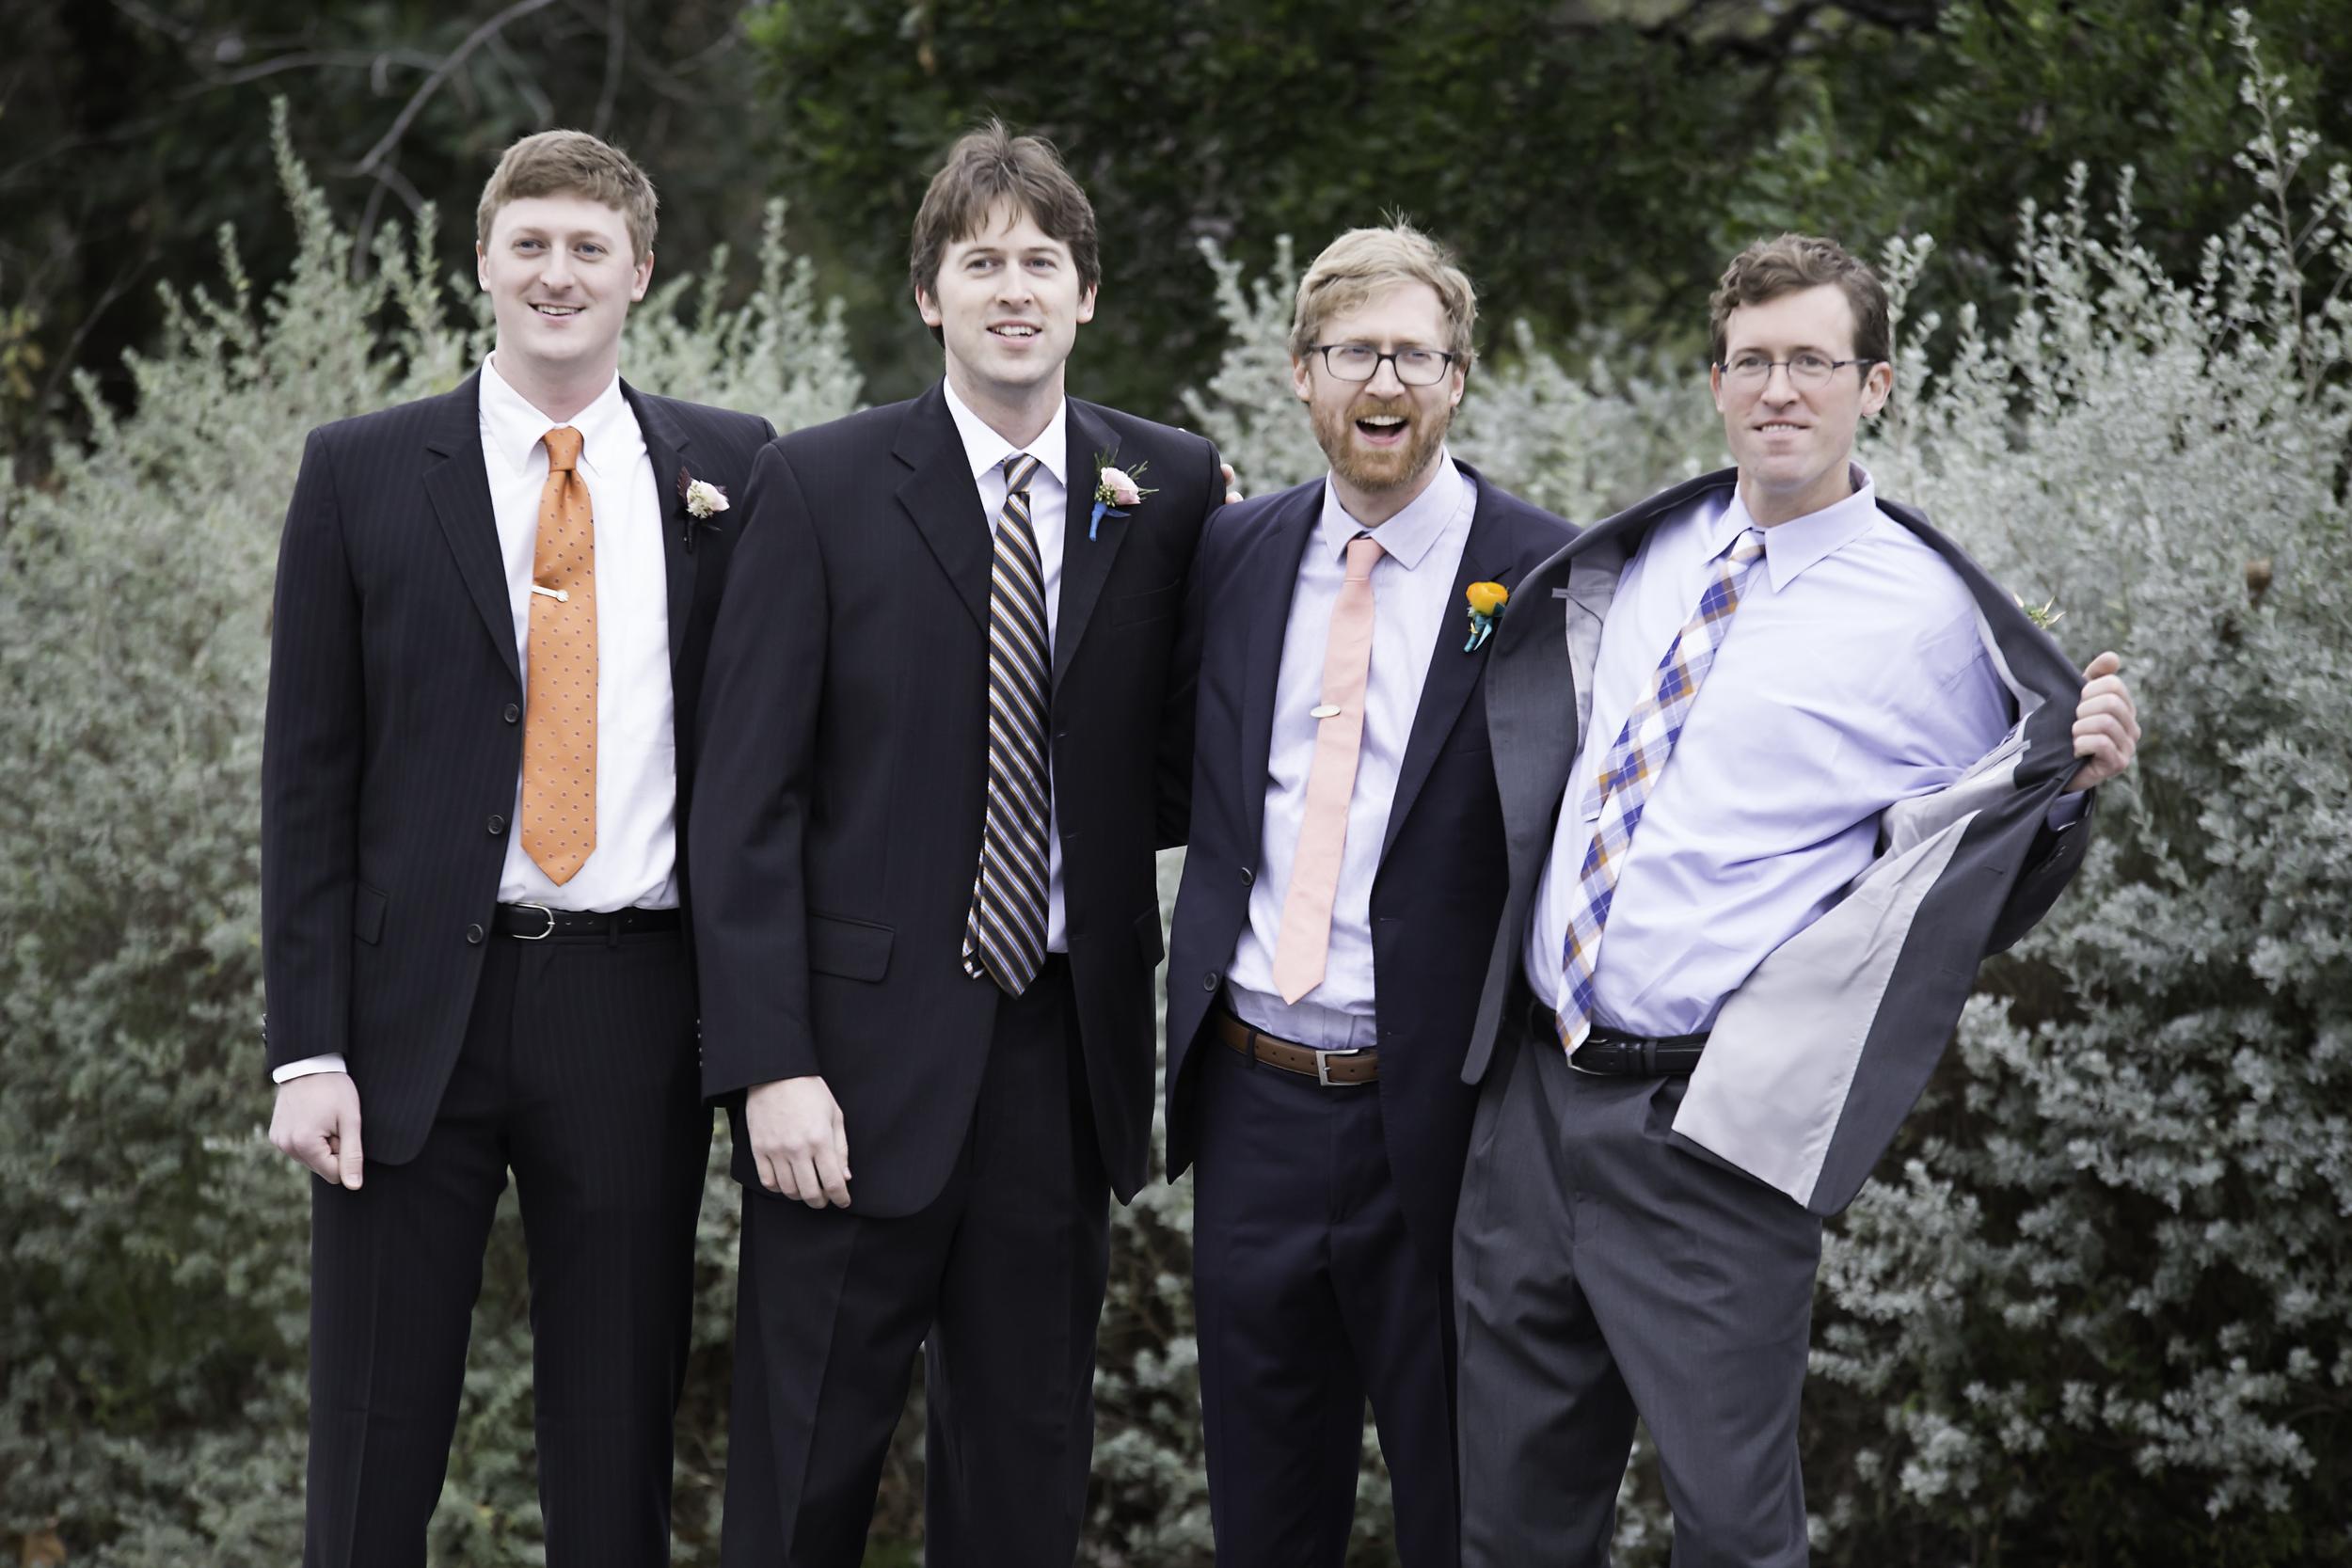 Austin_wedding_photographer_jolo4